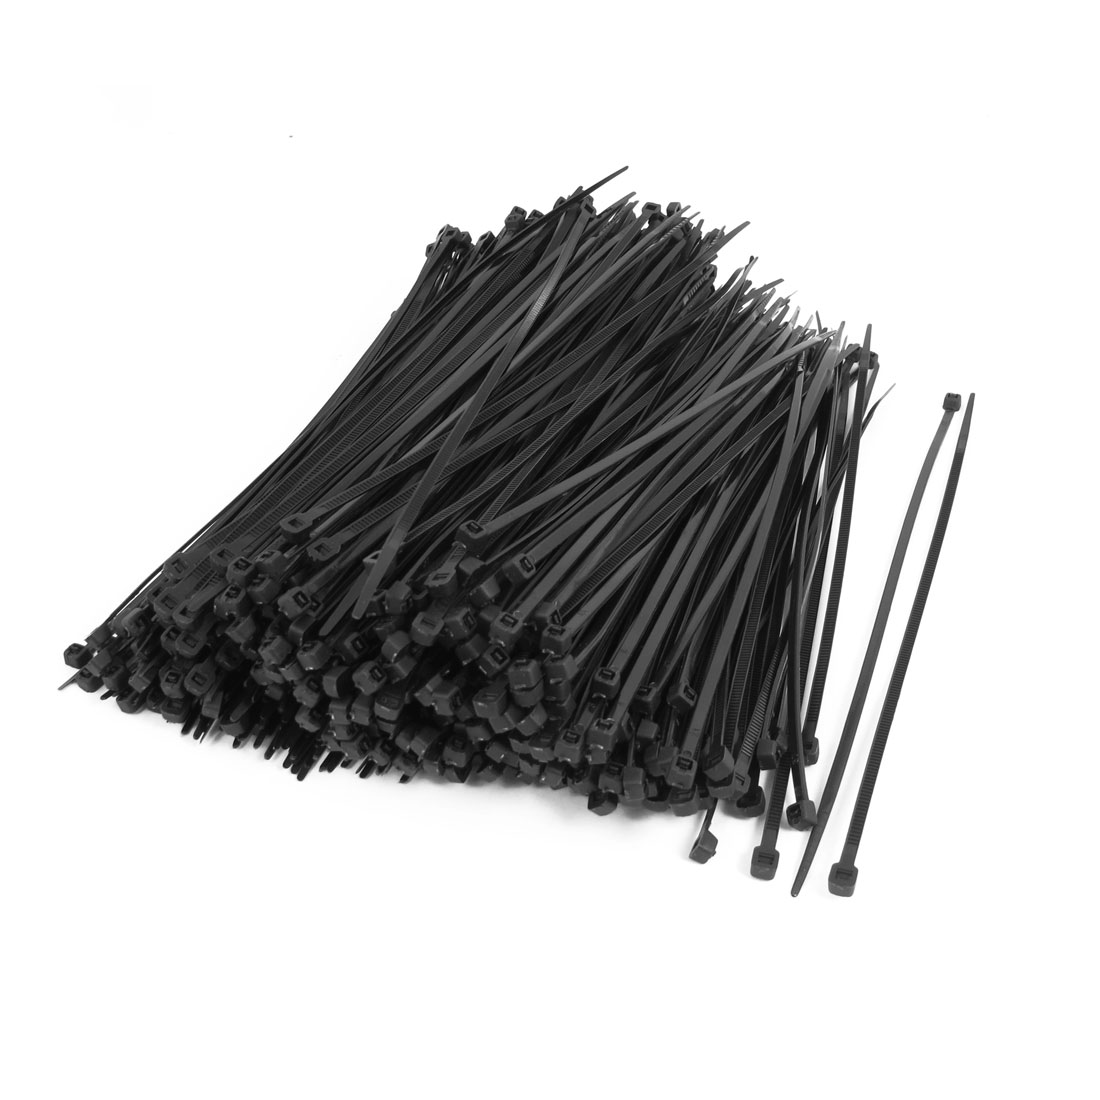 500PCS Nylon Zip Trim Wrap Loop Flexible Wire Cable Tie 4mmx200mm